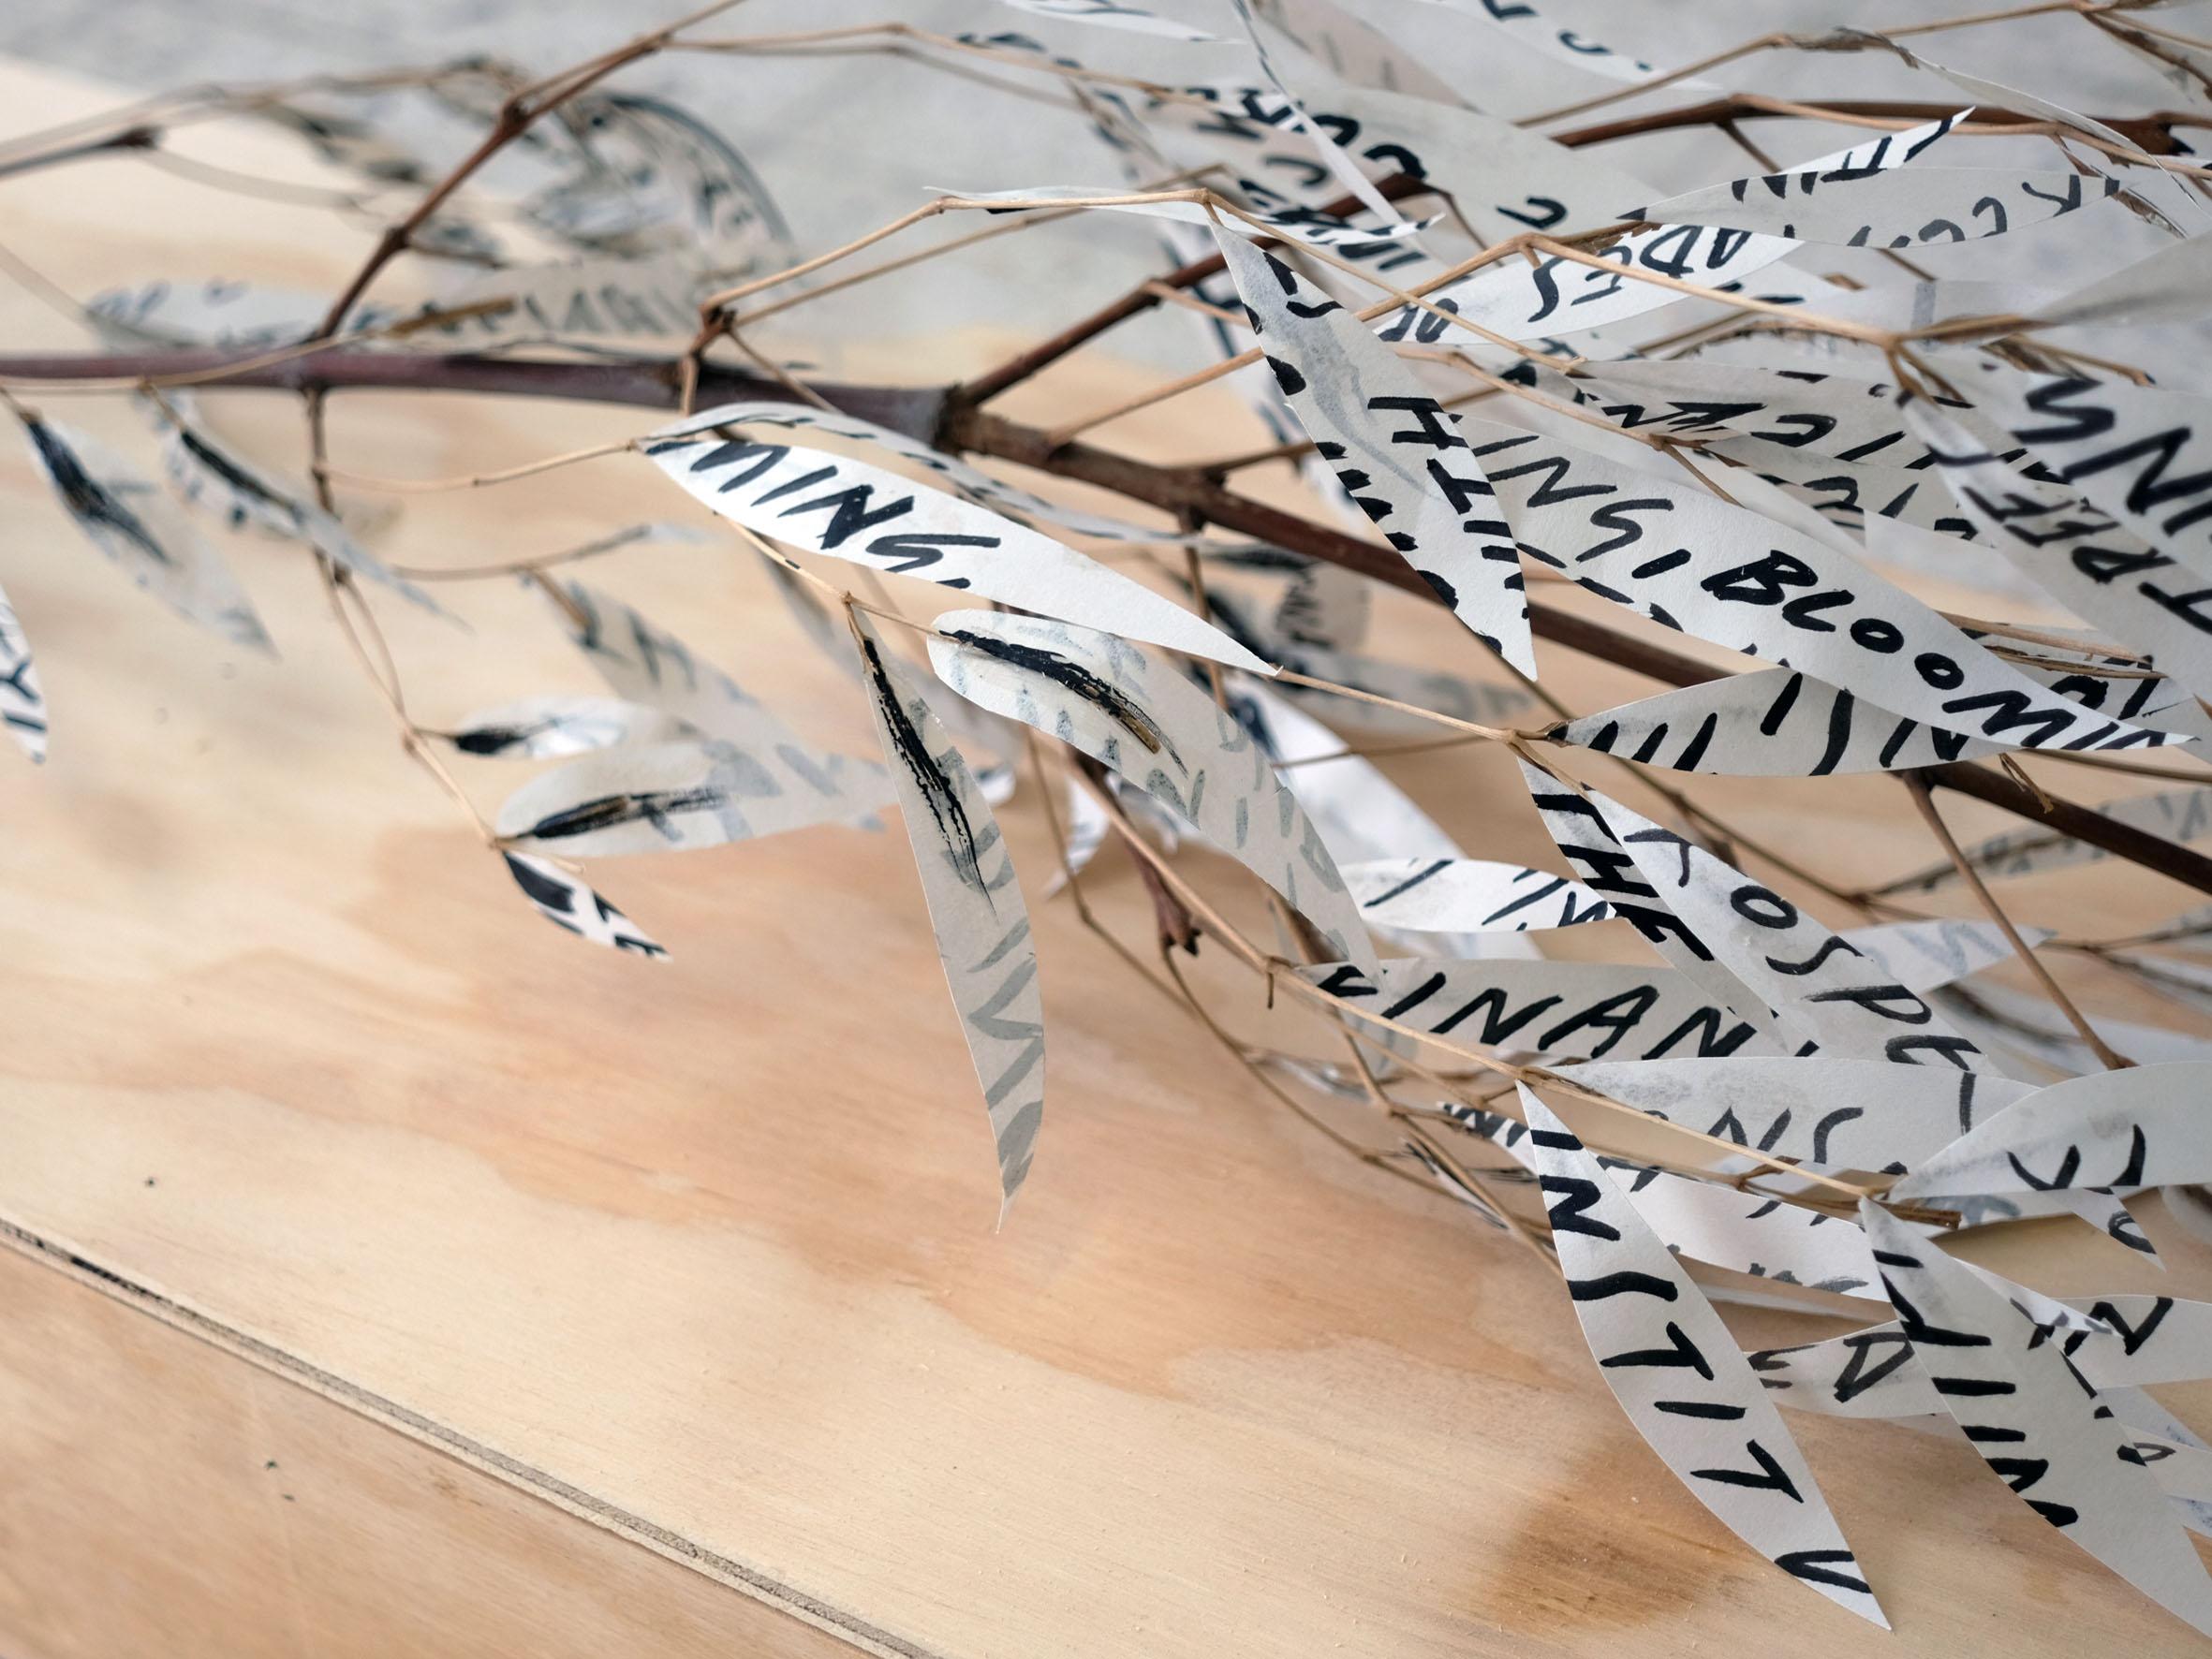 Charlie Godet Thomas, The Soft-Dying Day (detail), 2020. Acrylic on newsprint, branch, glue, screws, timber. 133 x 35 x 36 cm.